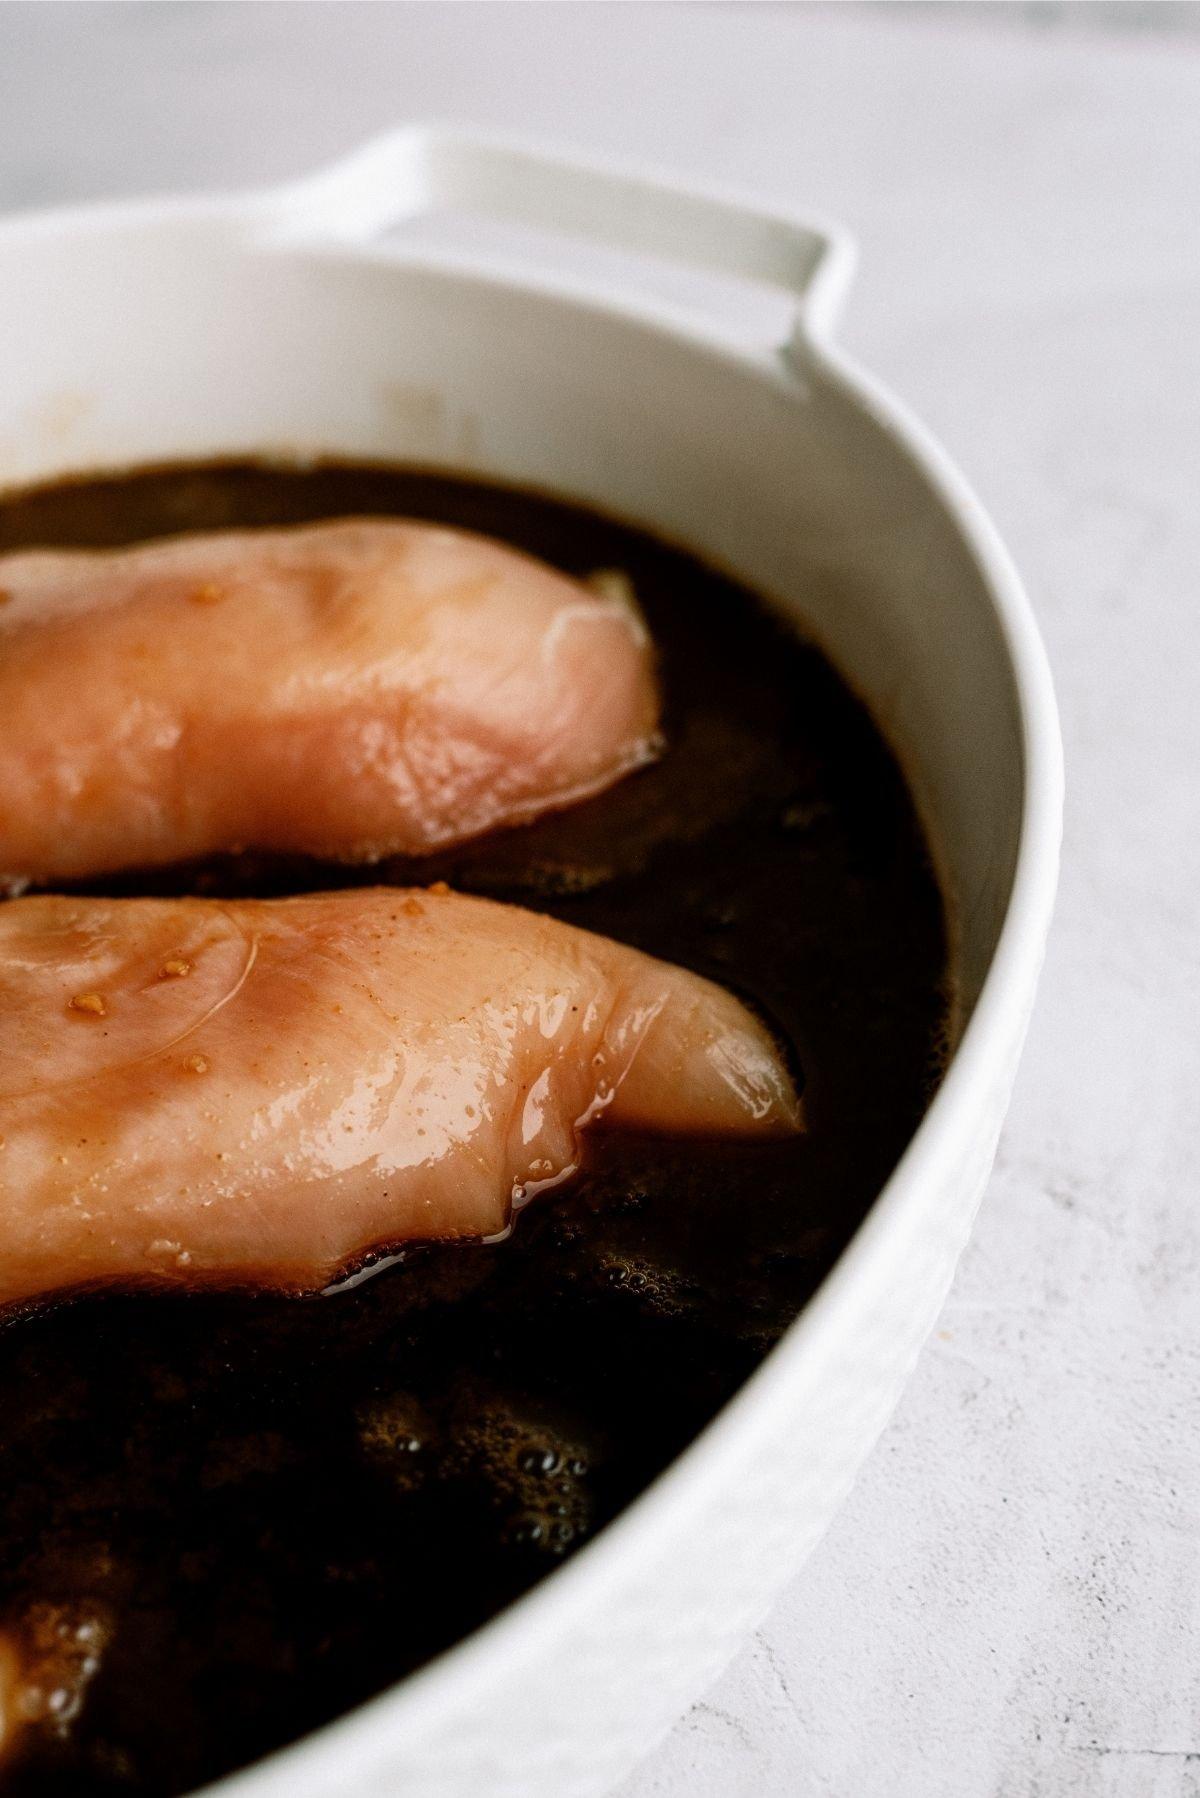 Raw Chicken Breast in sauce for Teriyaki Chicken Casserole Recipe